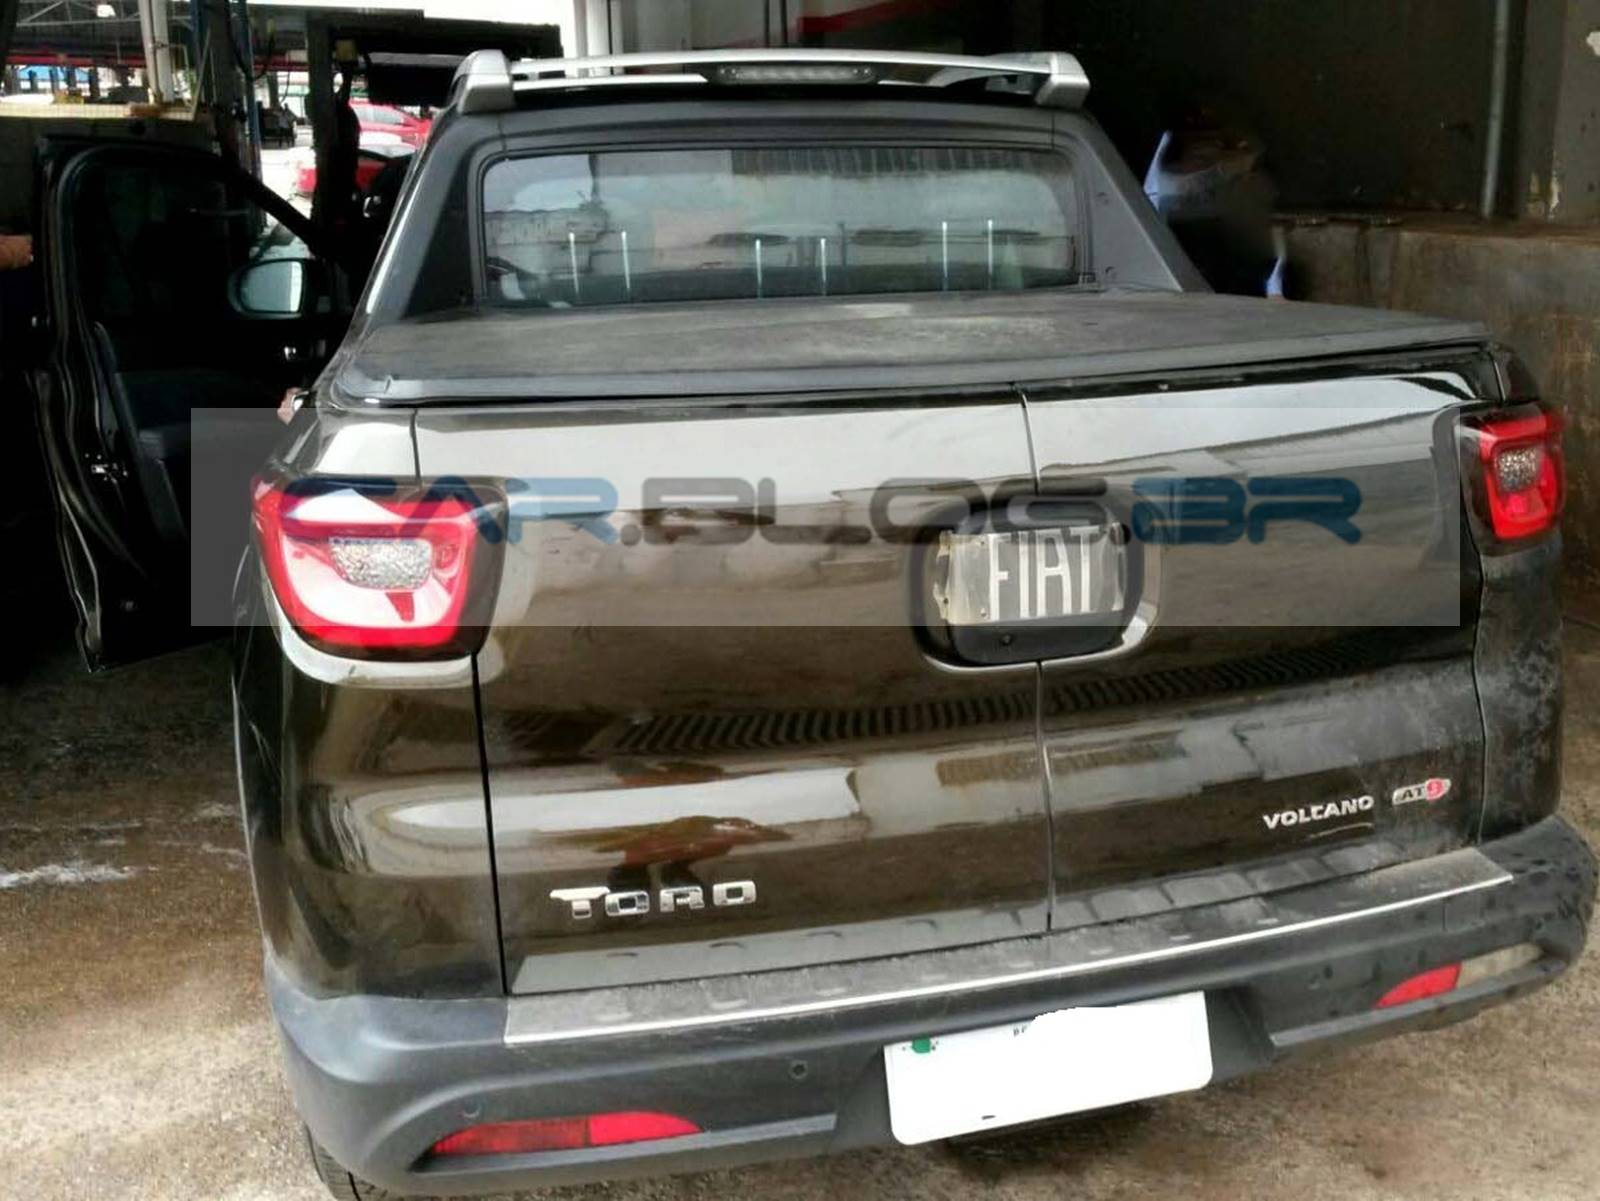 Fiat Toro Diesel 4x4 Volcano Automática